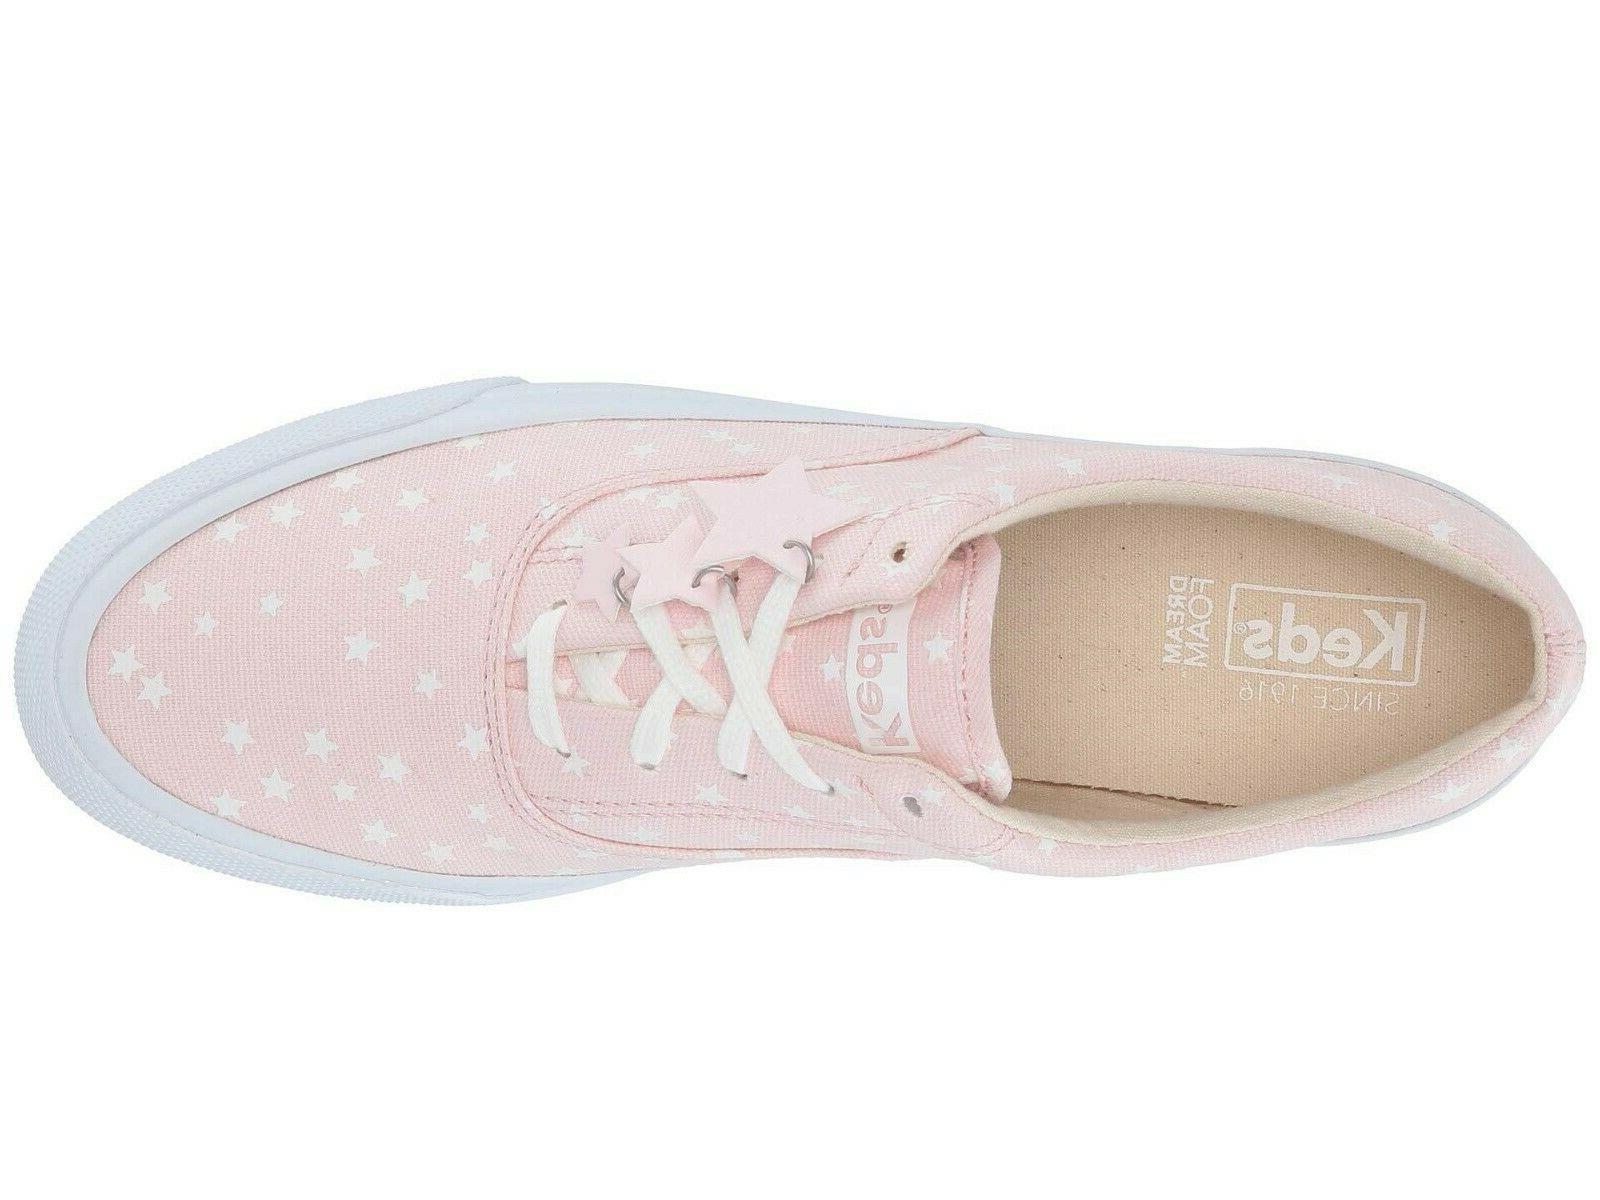 Keds Anchor In Dark Sneakers,